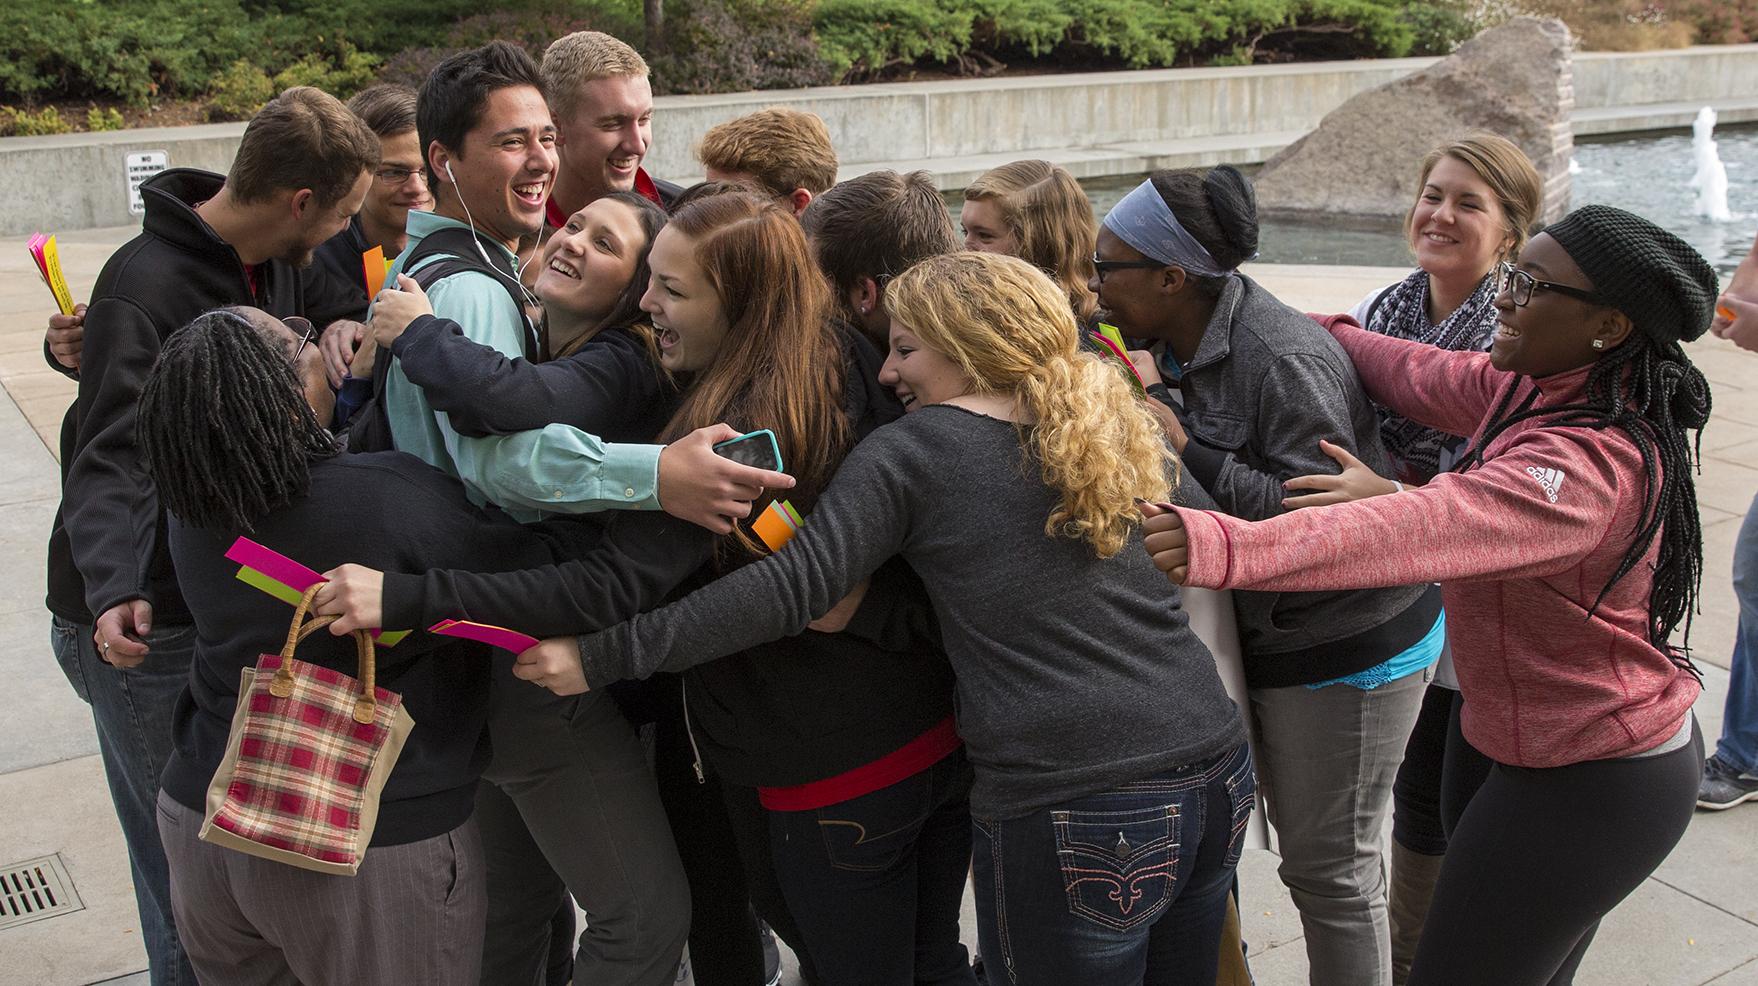 Free hugs experiment breaks social norms | Nebraska Today ...